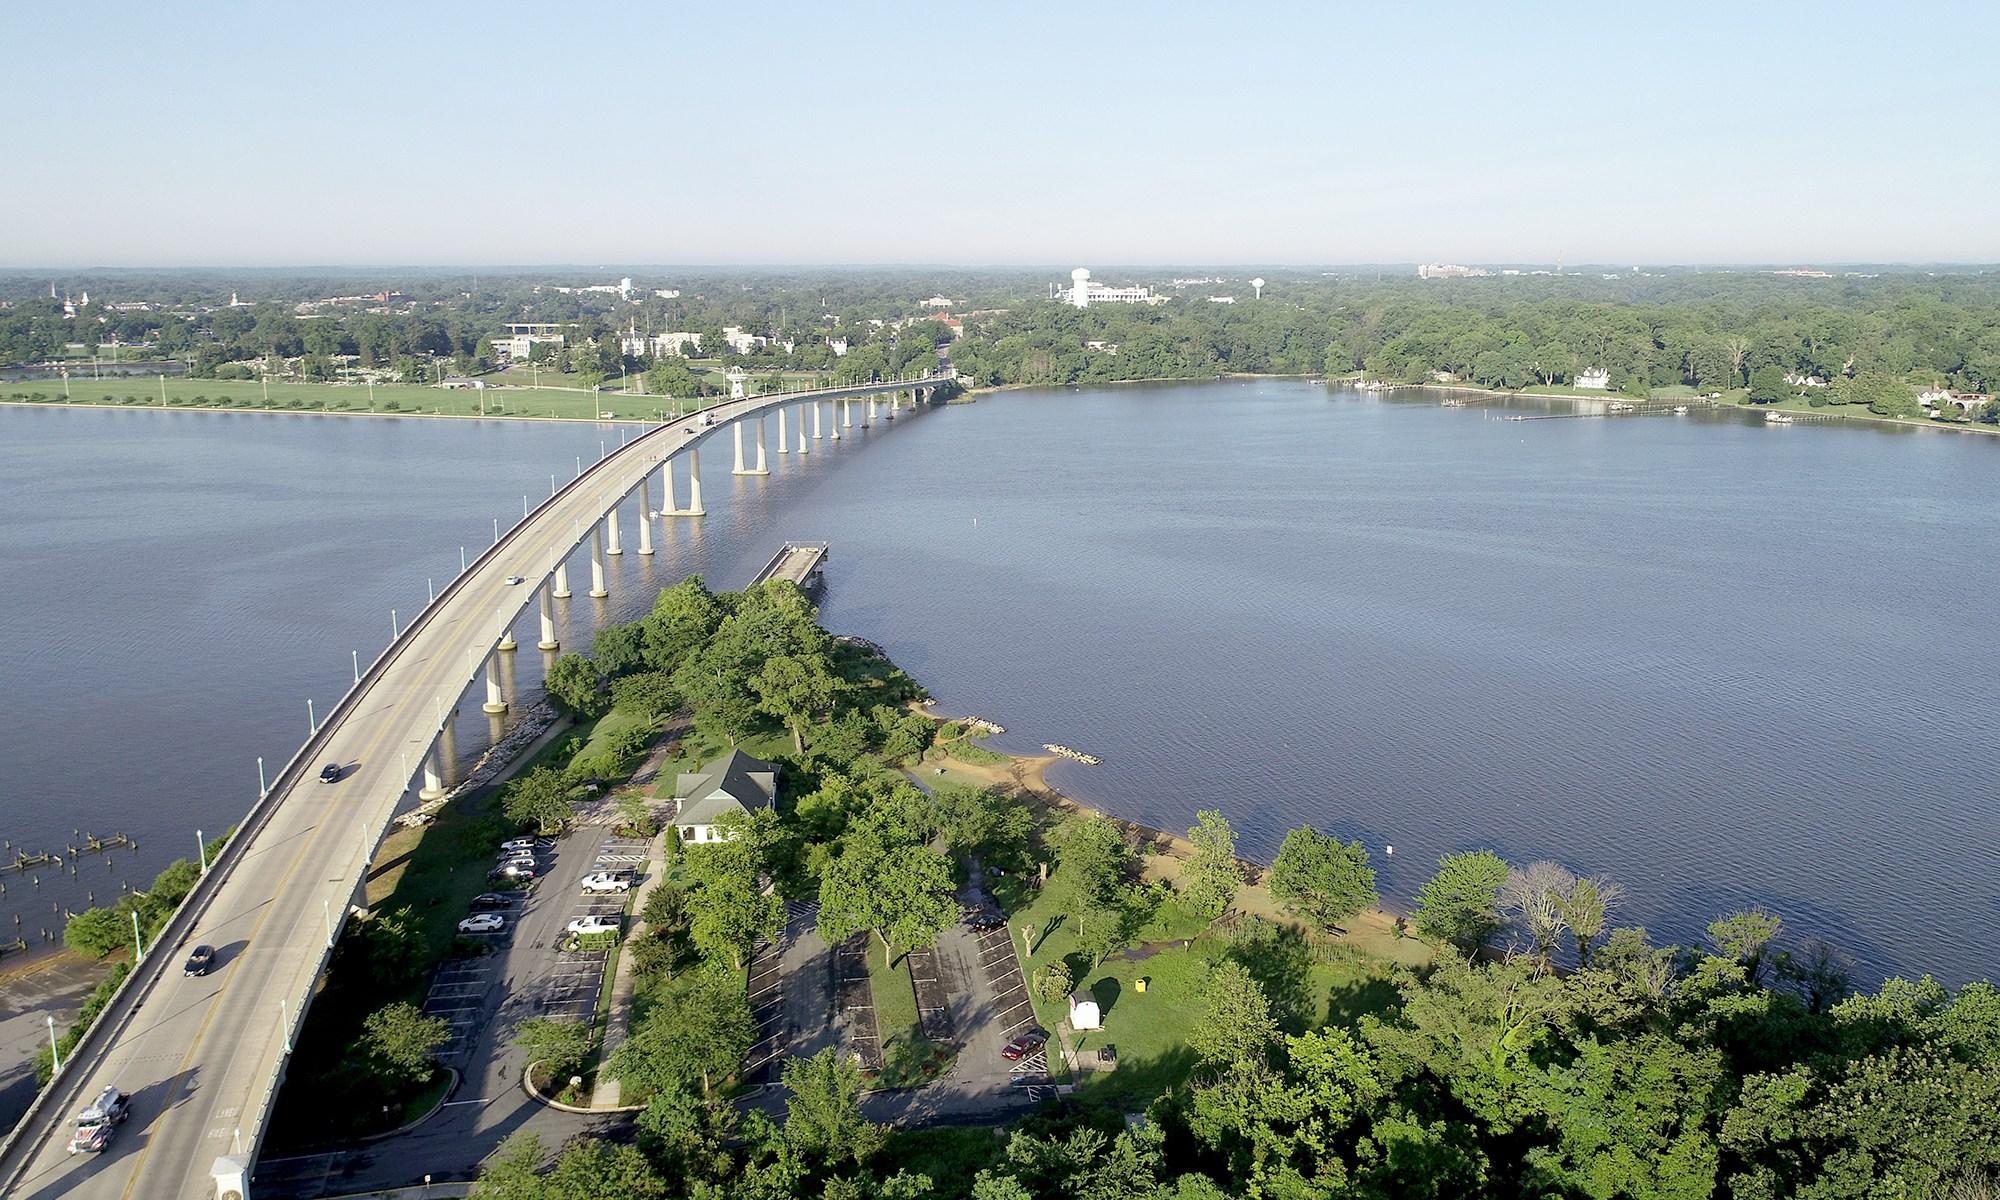 U.S. Naval Academy bridge crossing the Severn River